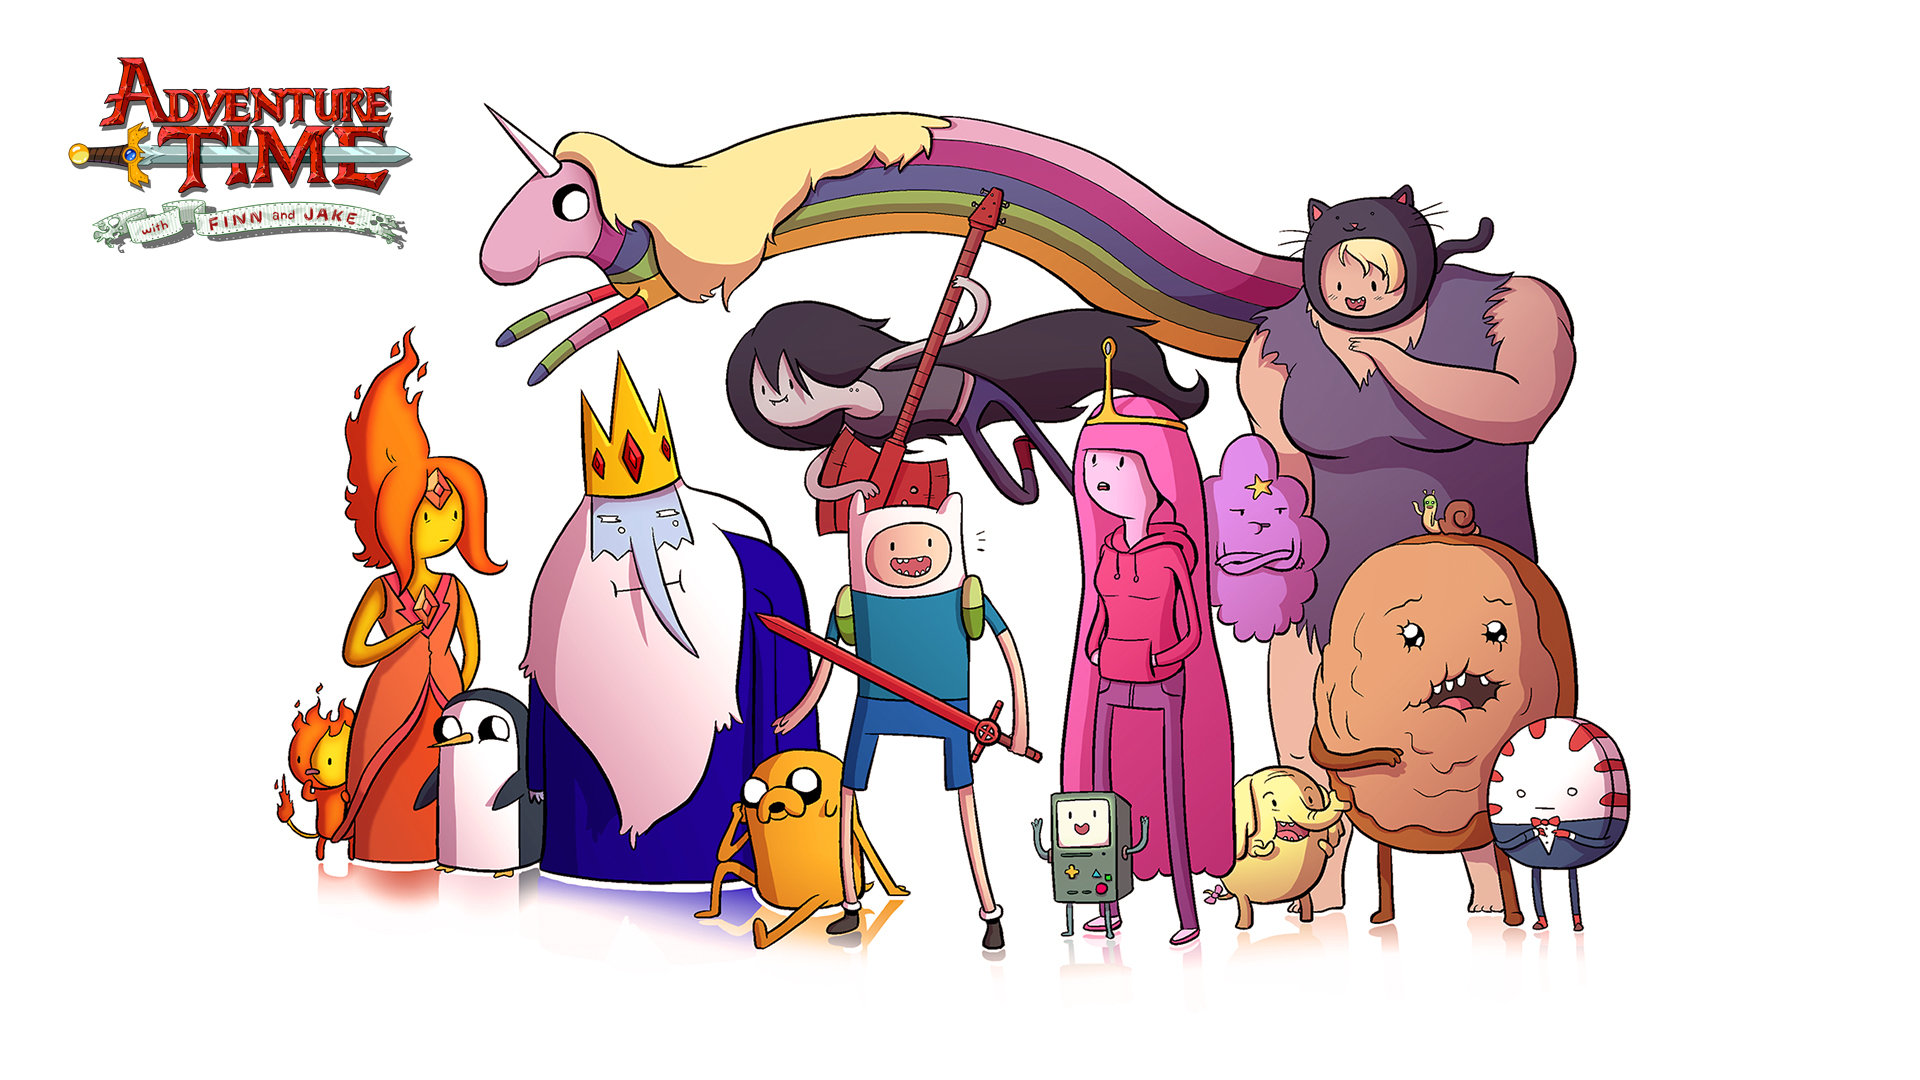 Adventure Time Wallpapers 1920x1080 Full Hd 1080p Desktop Backgrounds